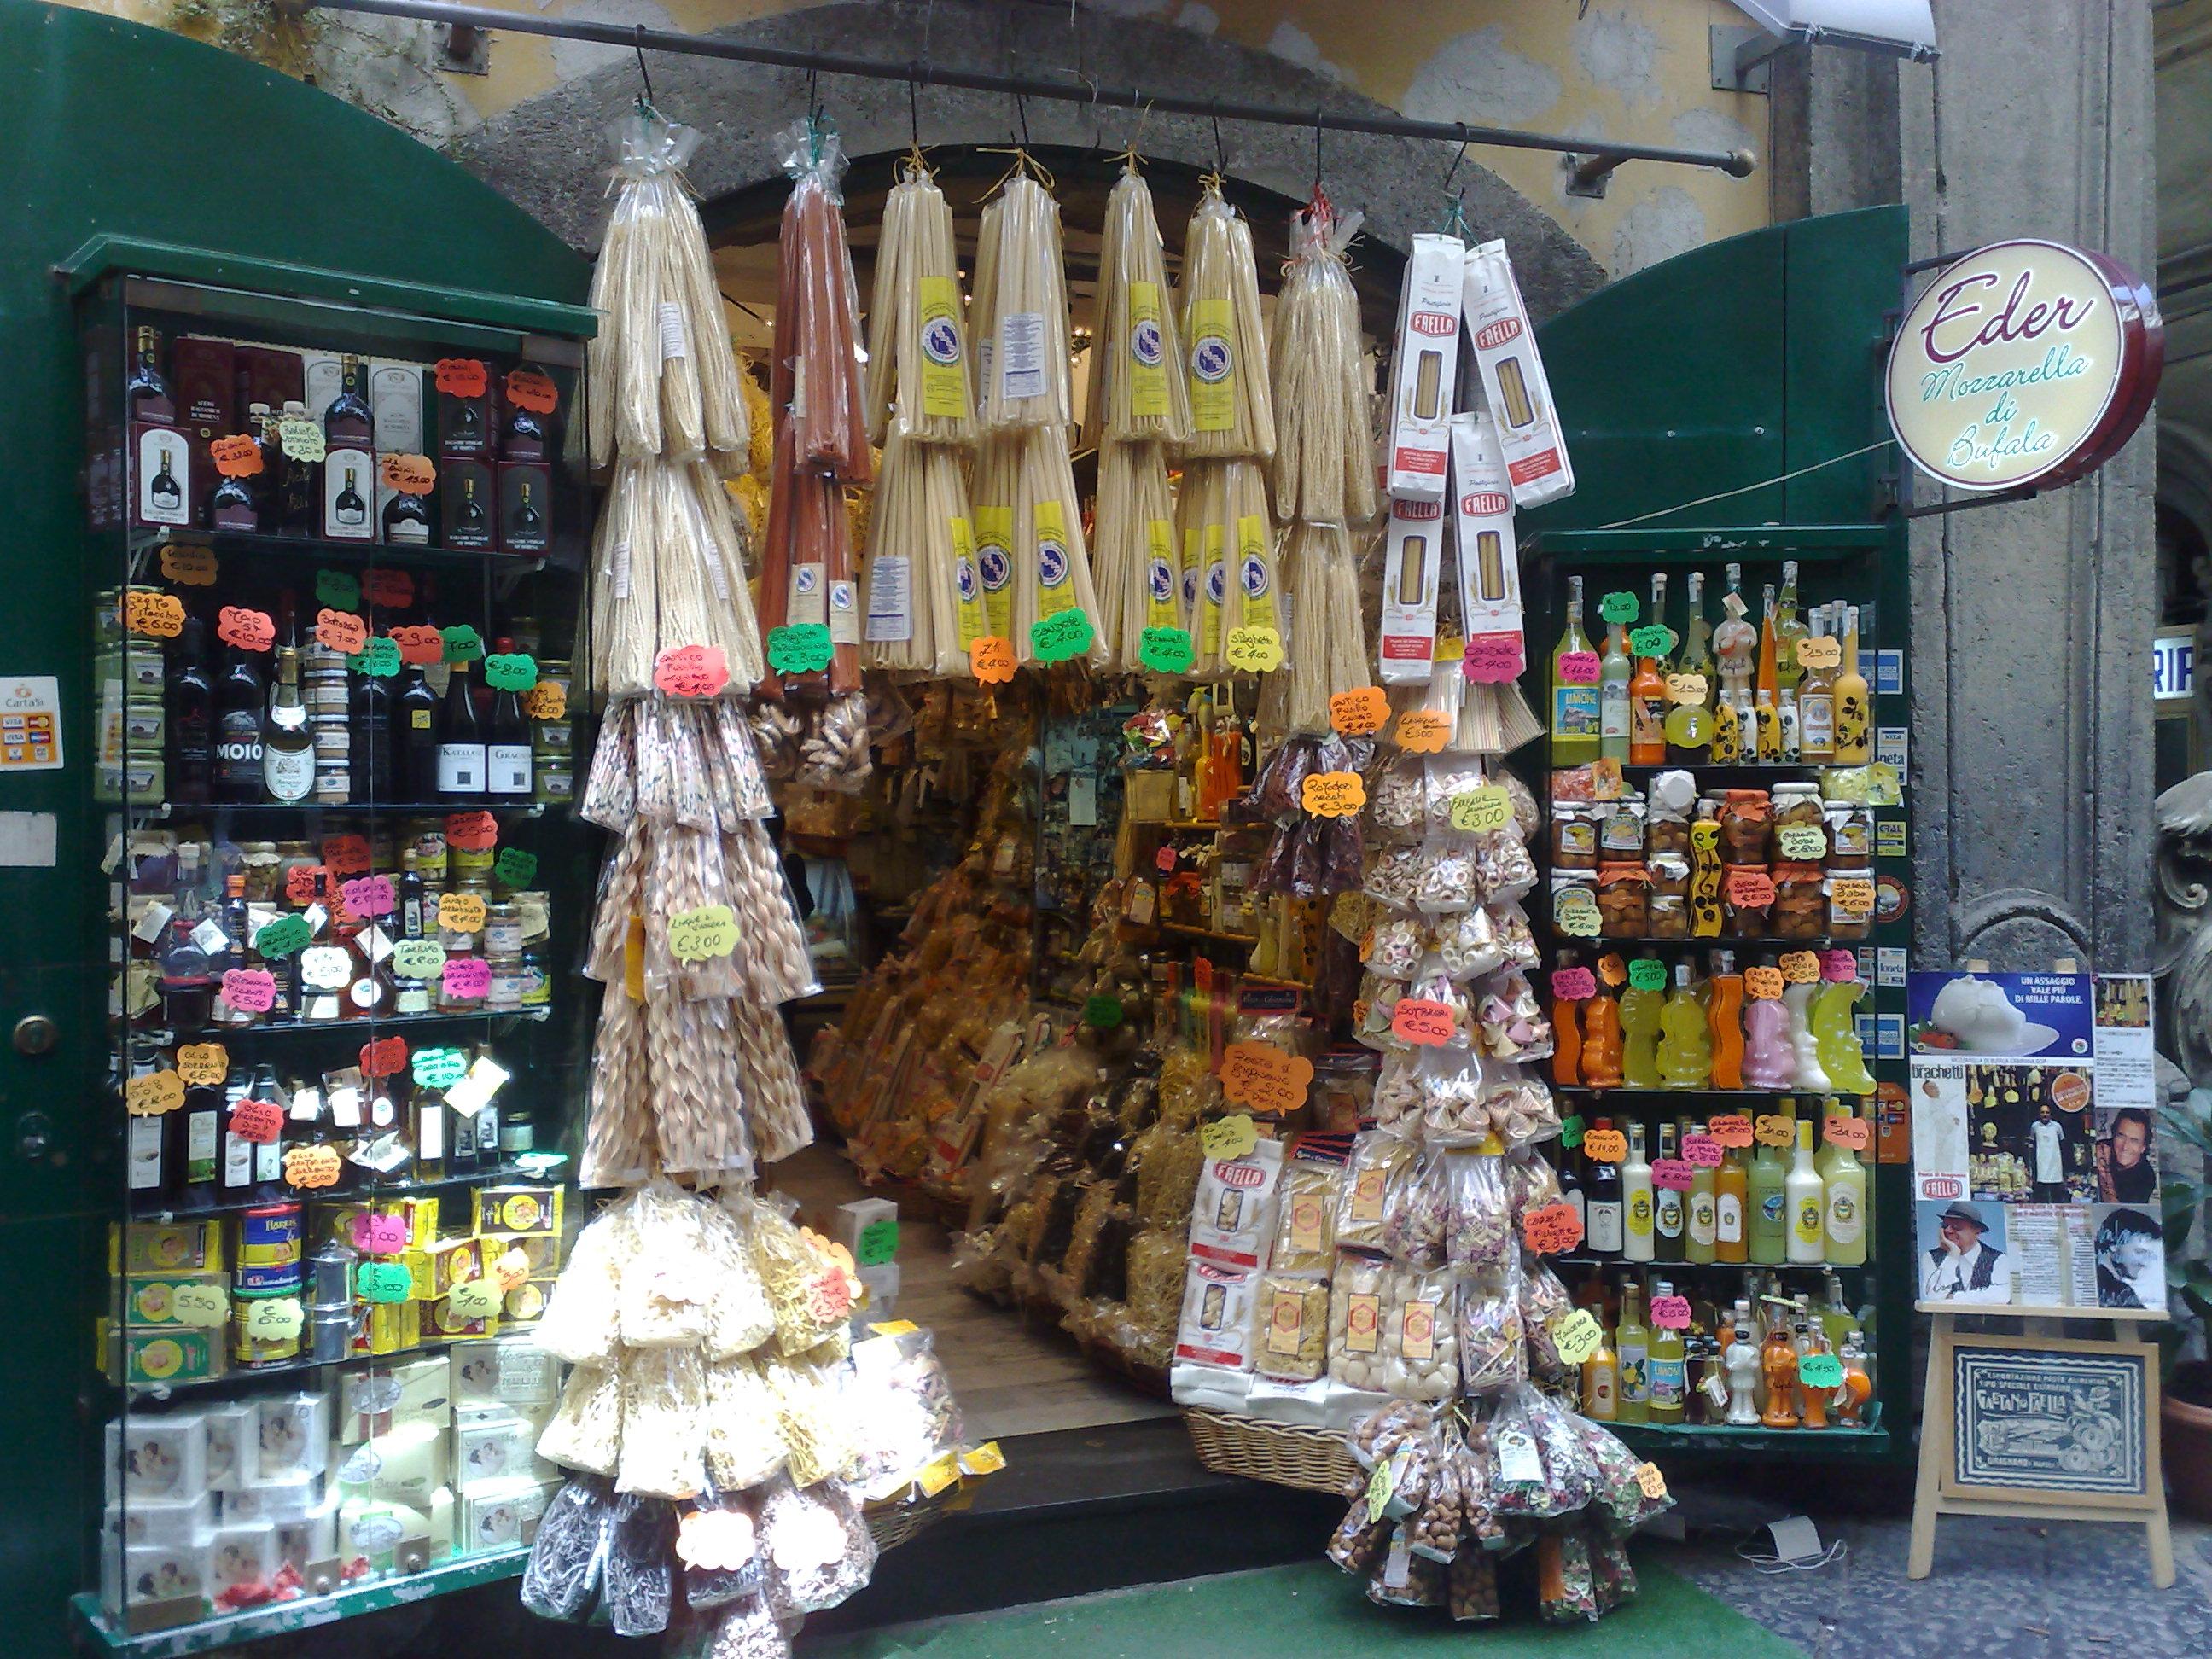 Cucine Usate Campania Napoli cucina napoletana - wikipedia